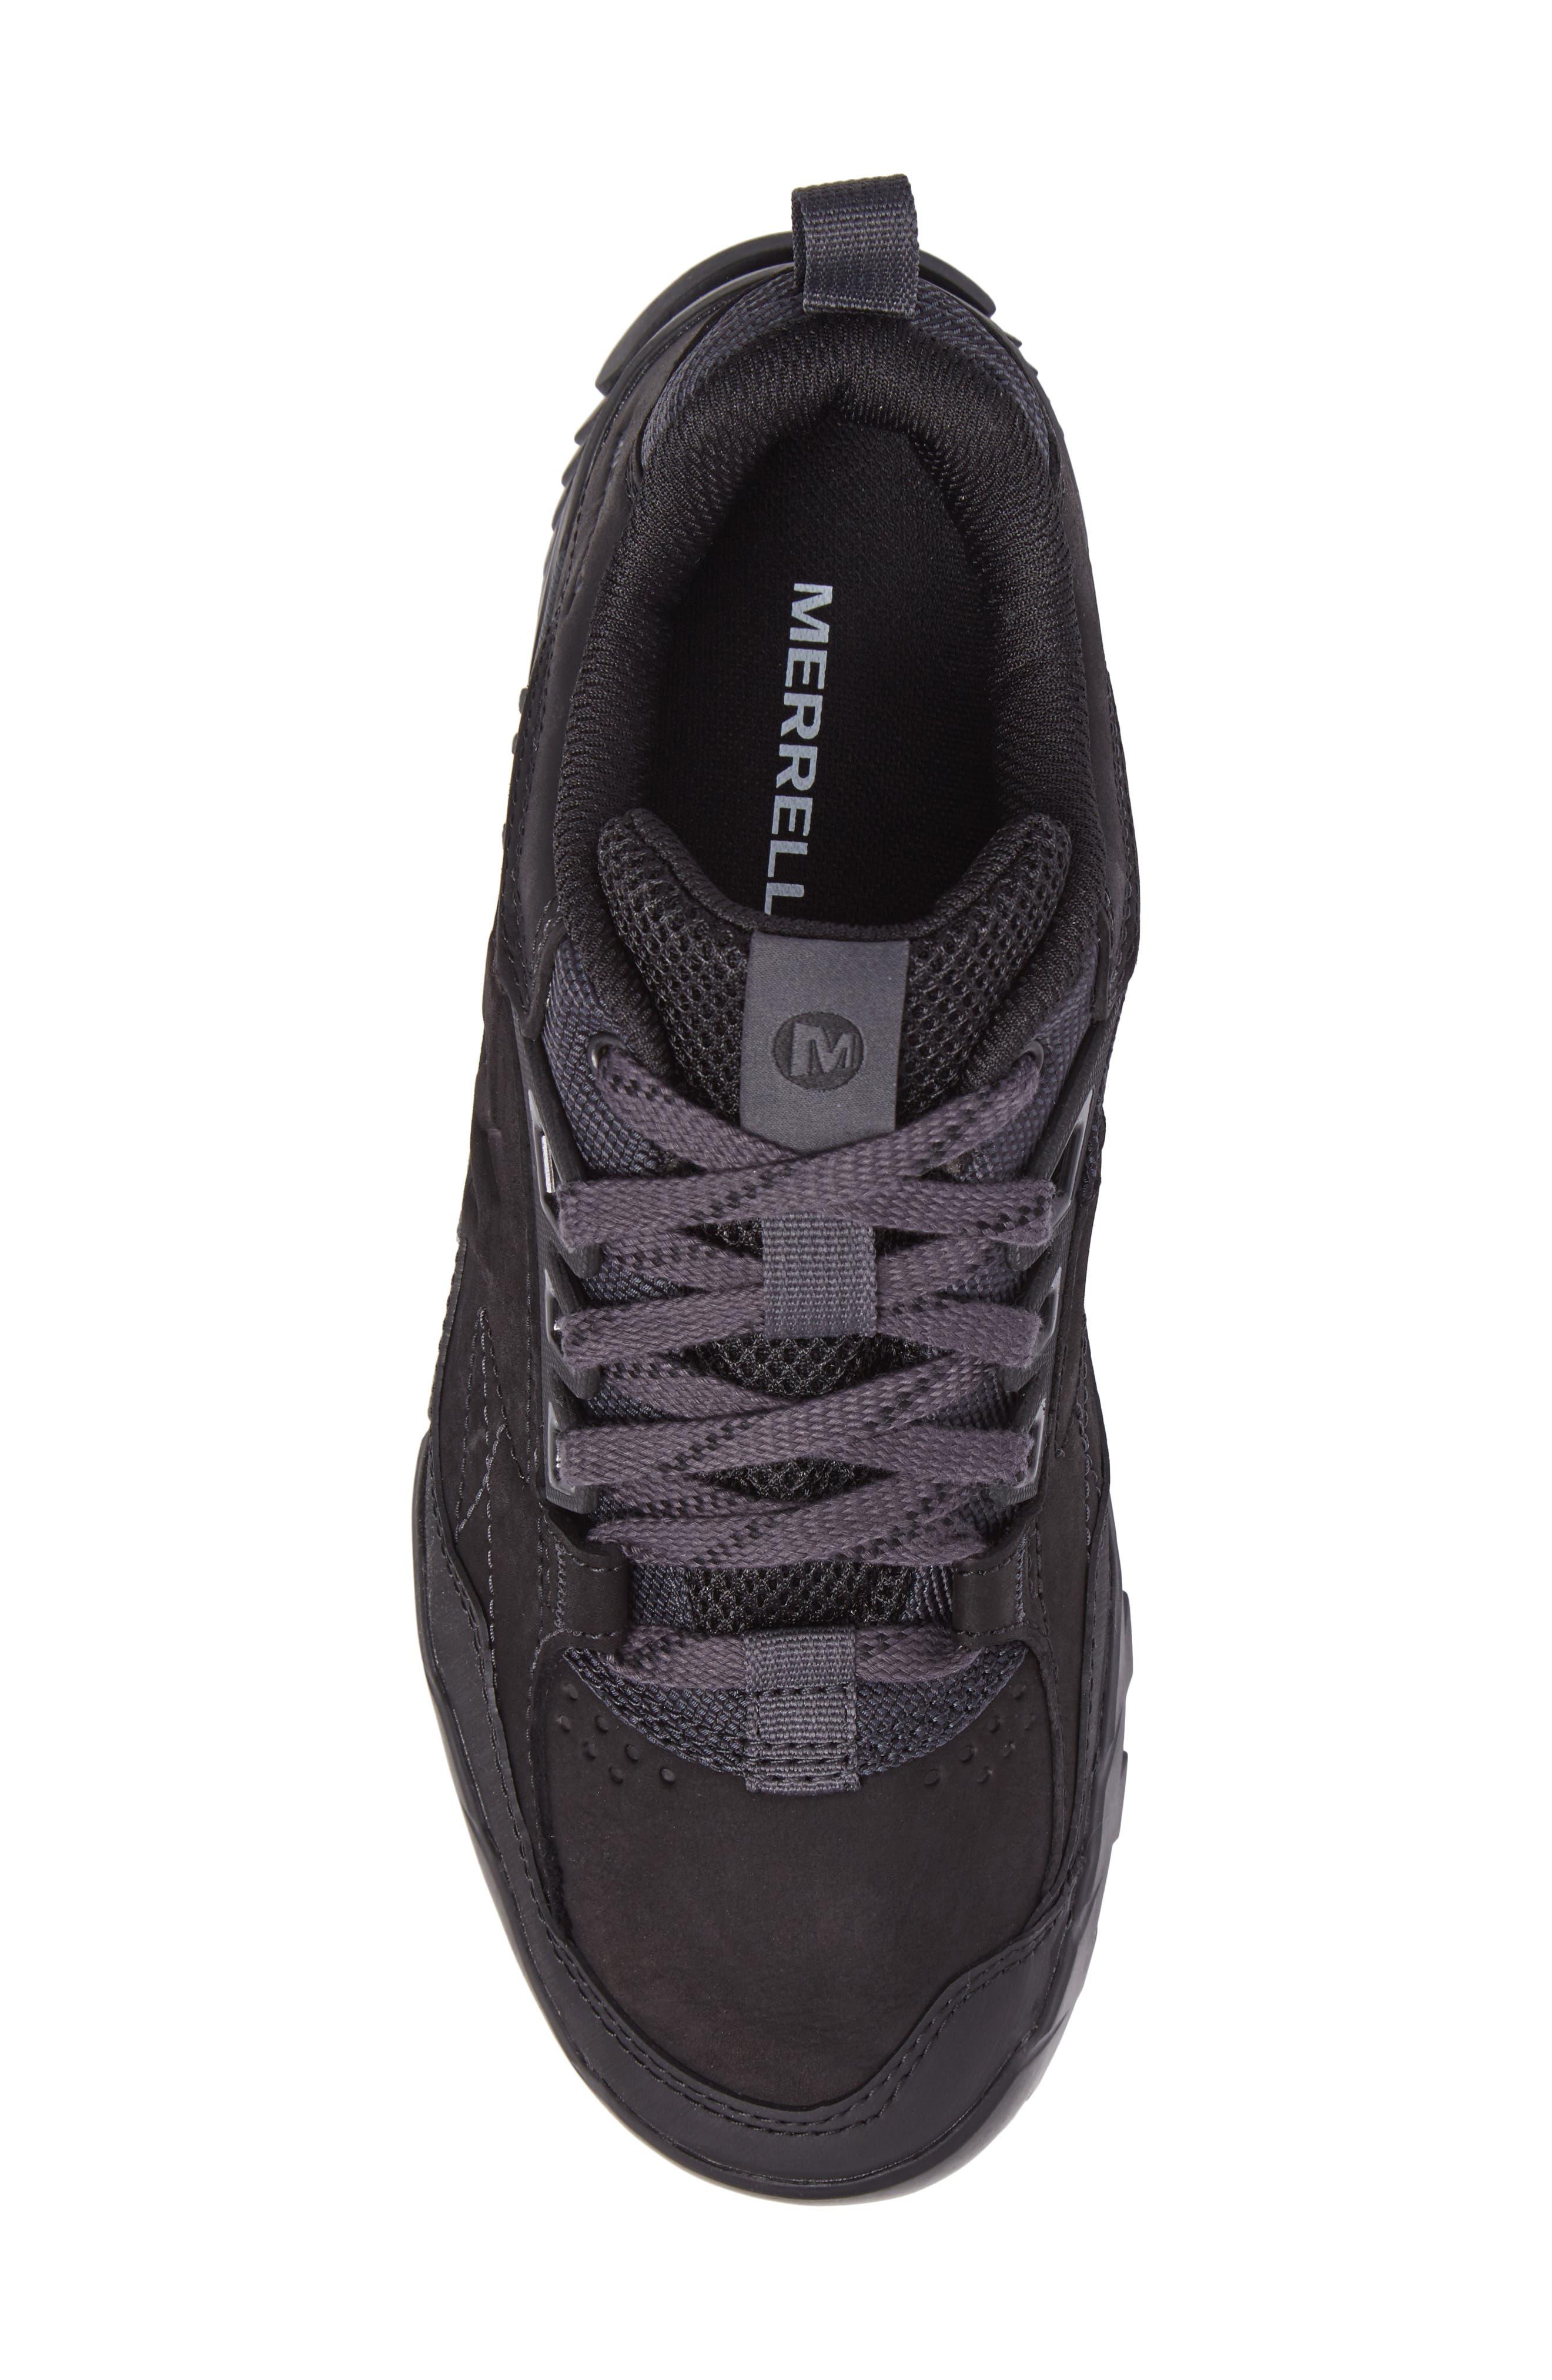 Annex Tak Low Hiking Shoe,                             Alternate thumbnail 5, color,                             BLACK NUBUCK LEATHER